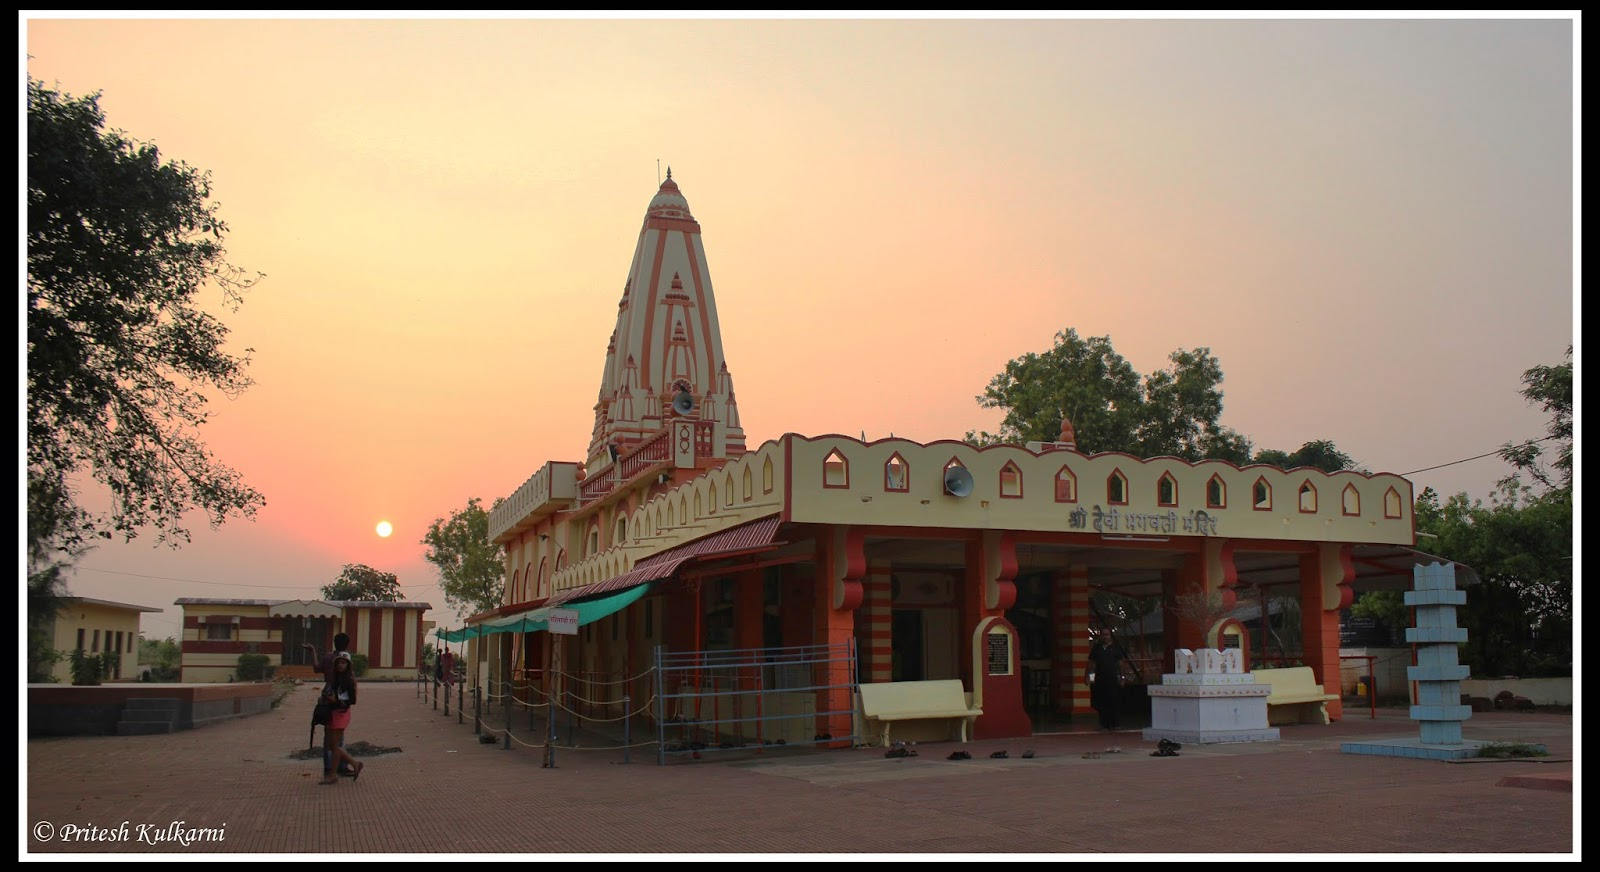 Bhagawati Temple